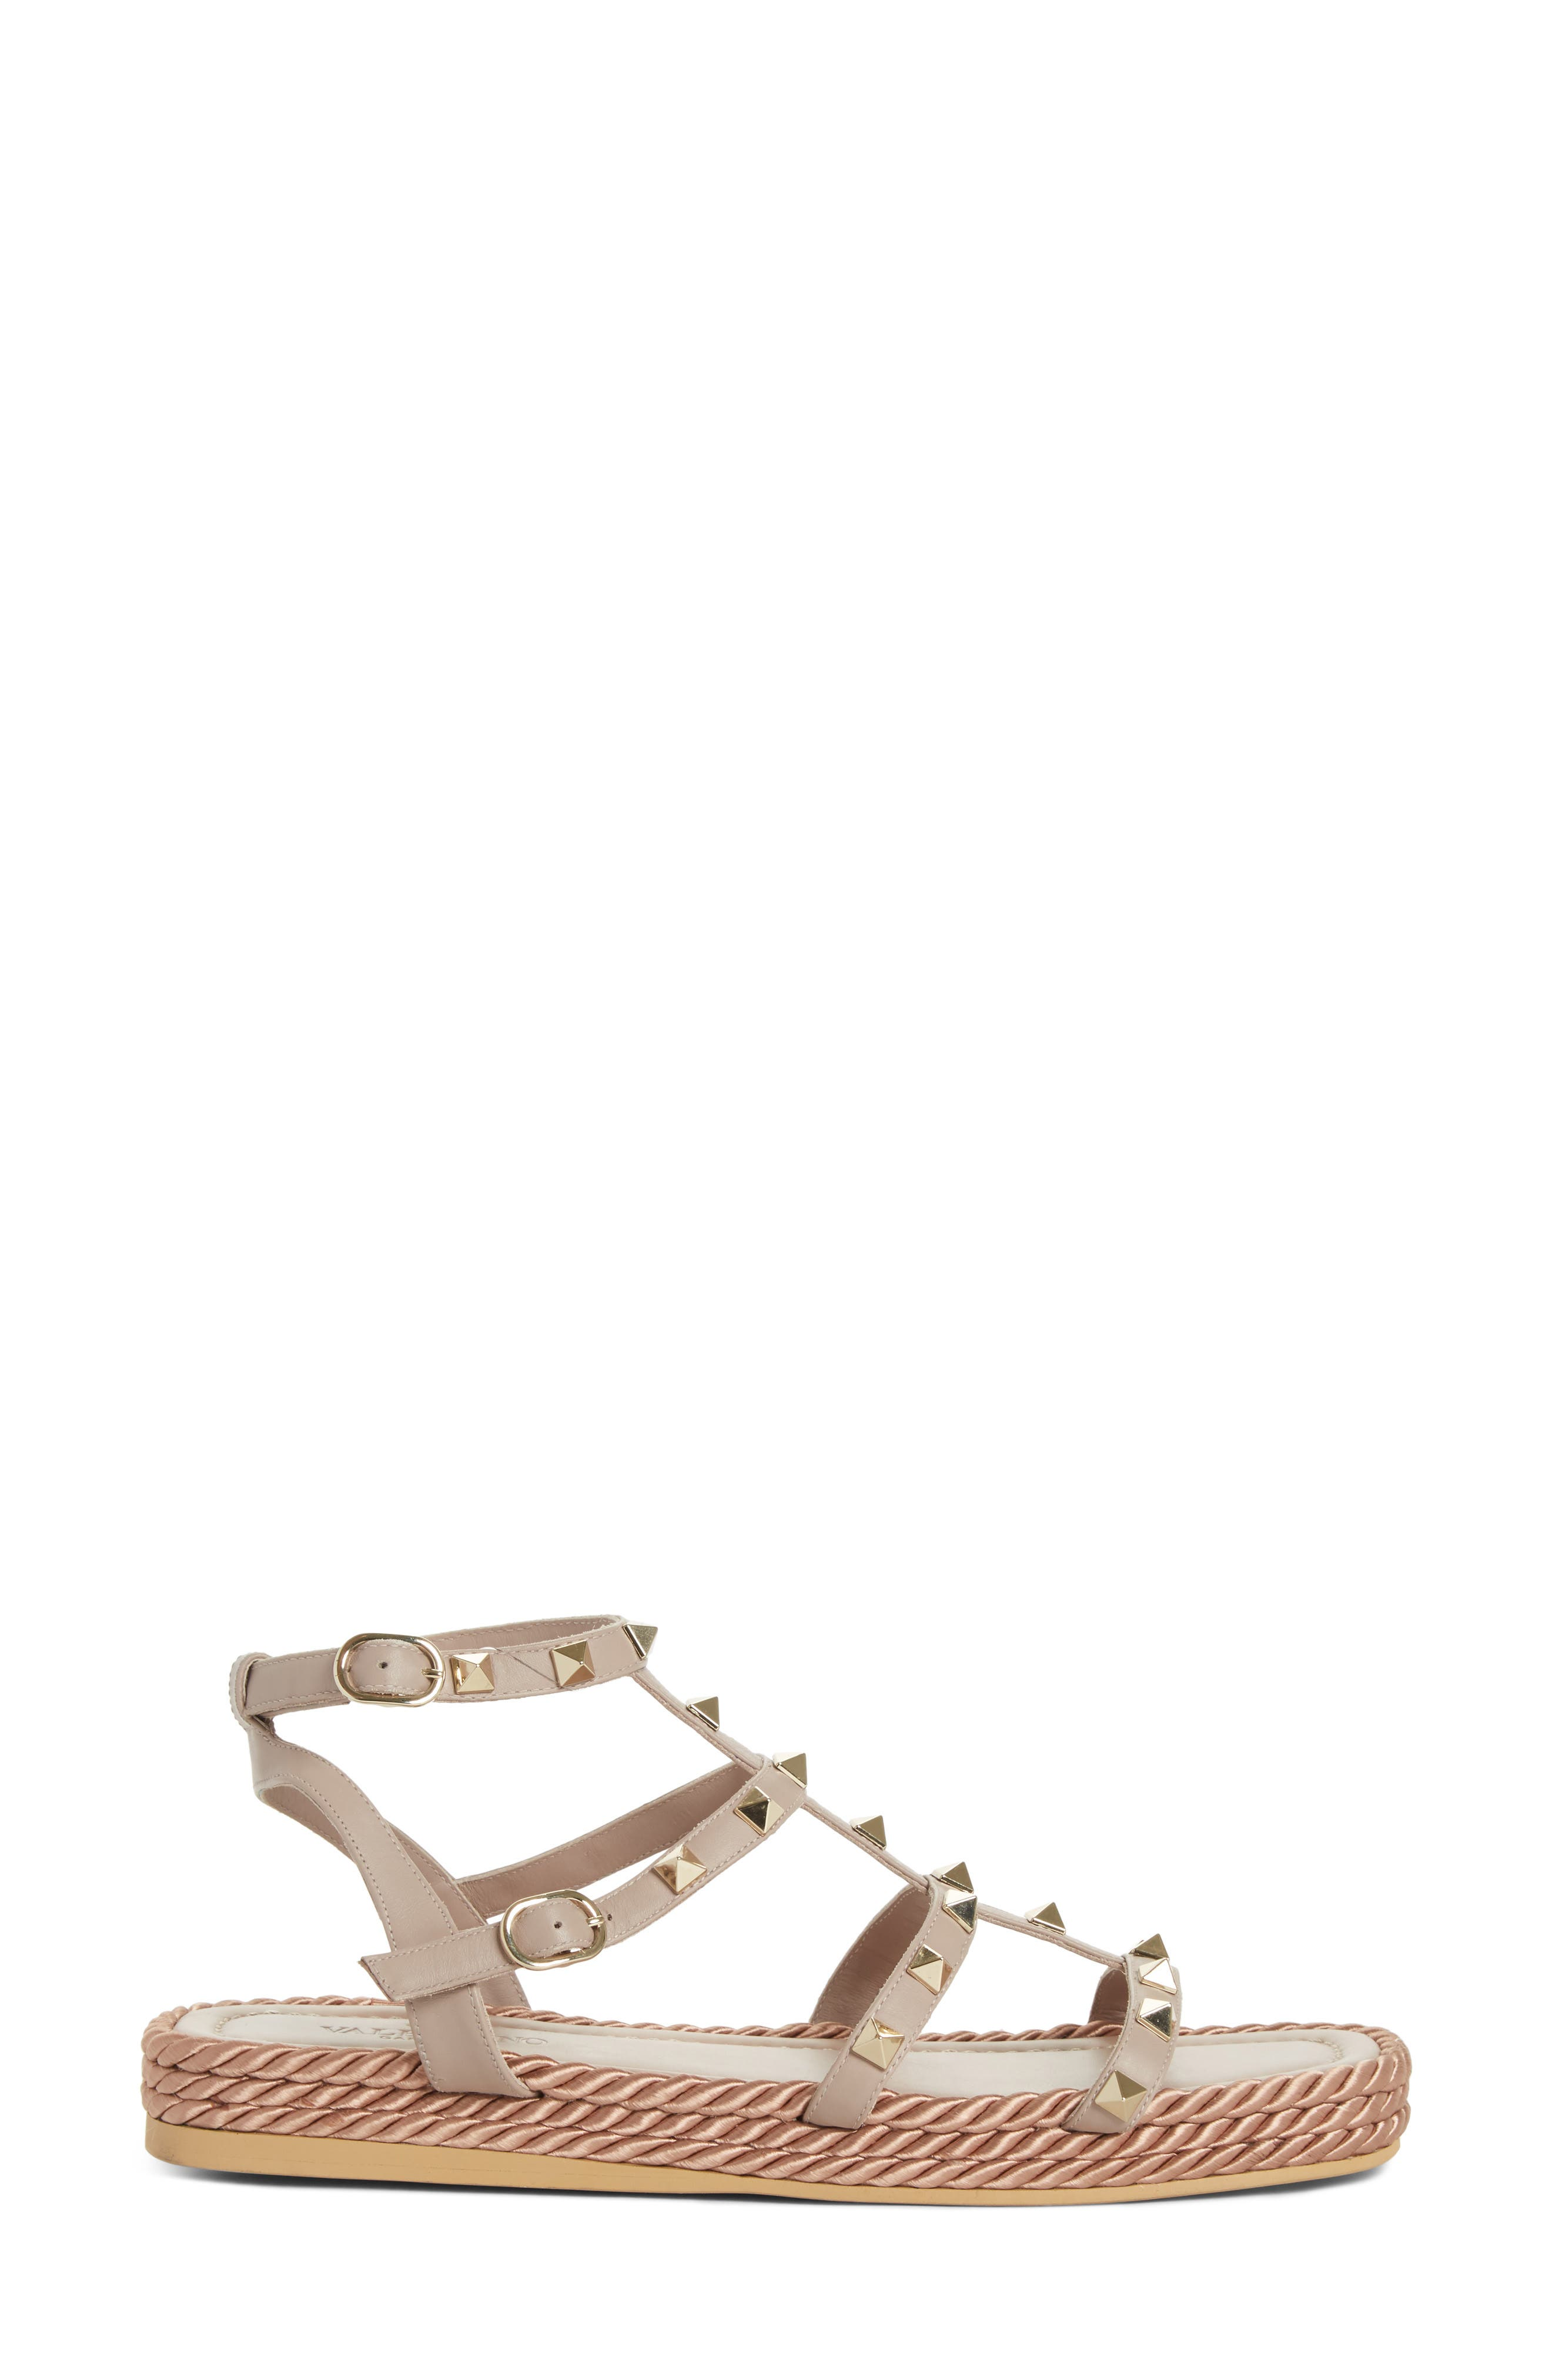 Torchon Strappy Sandal,                             Alternate thumbnail 3, color,                             Beige